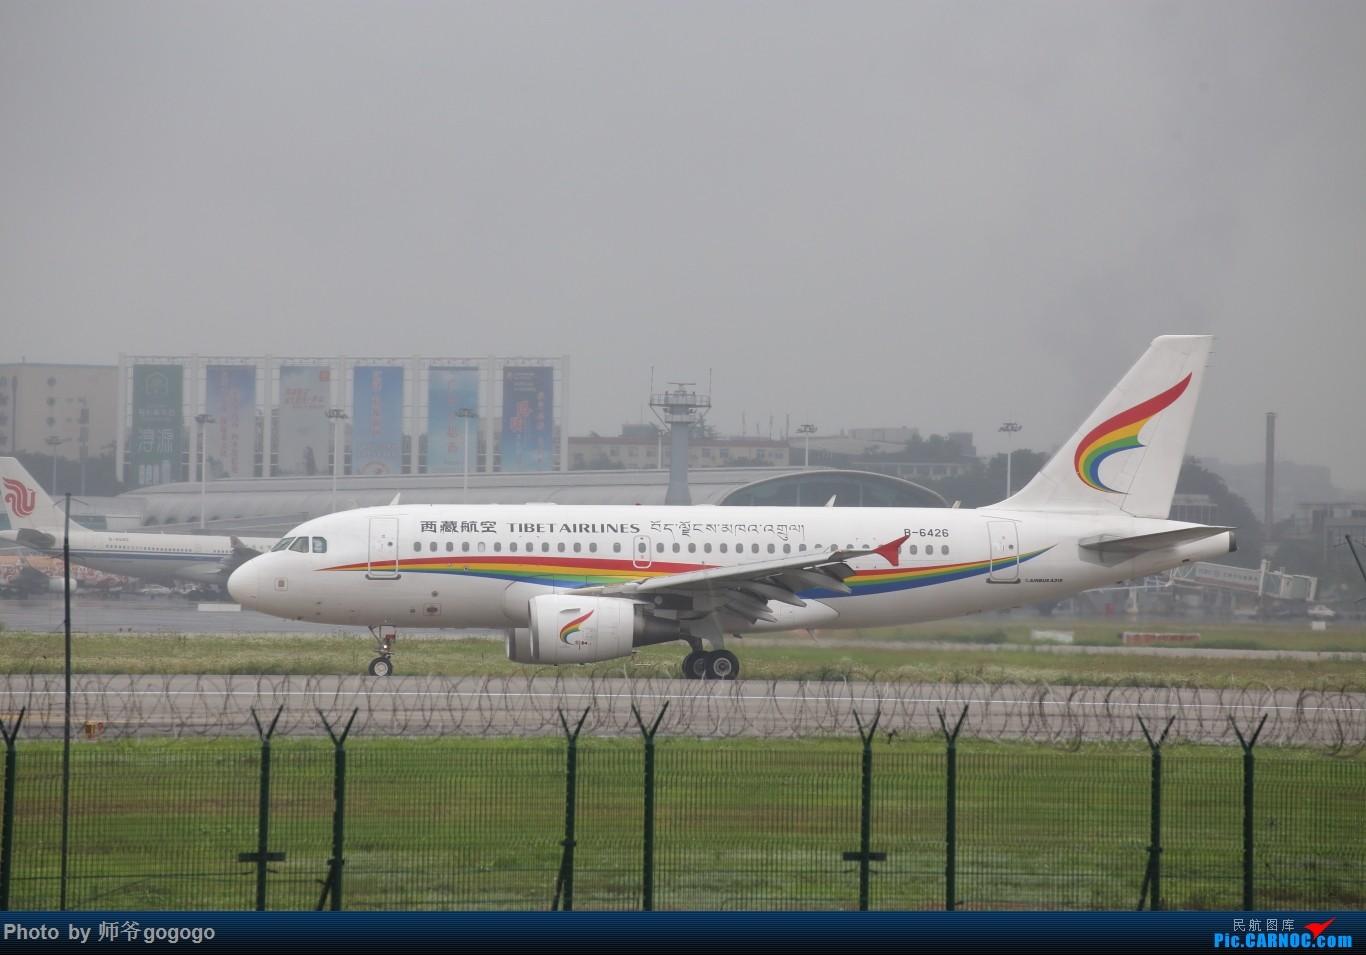 Re:[原创]雨天CKG处子行。 AIRBUS A319-100 B-6426 重庆江北国际机场